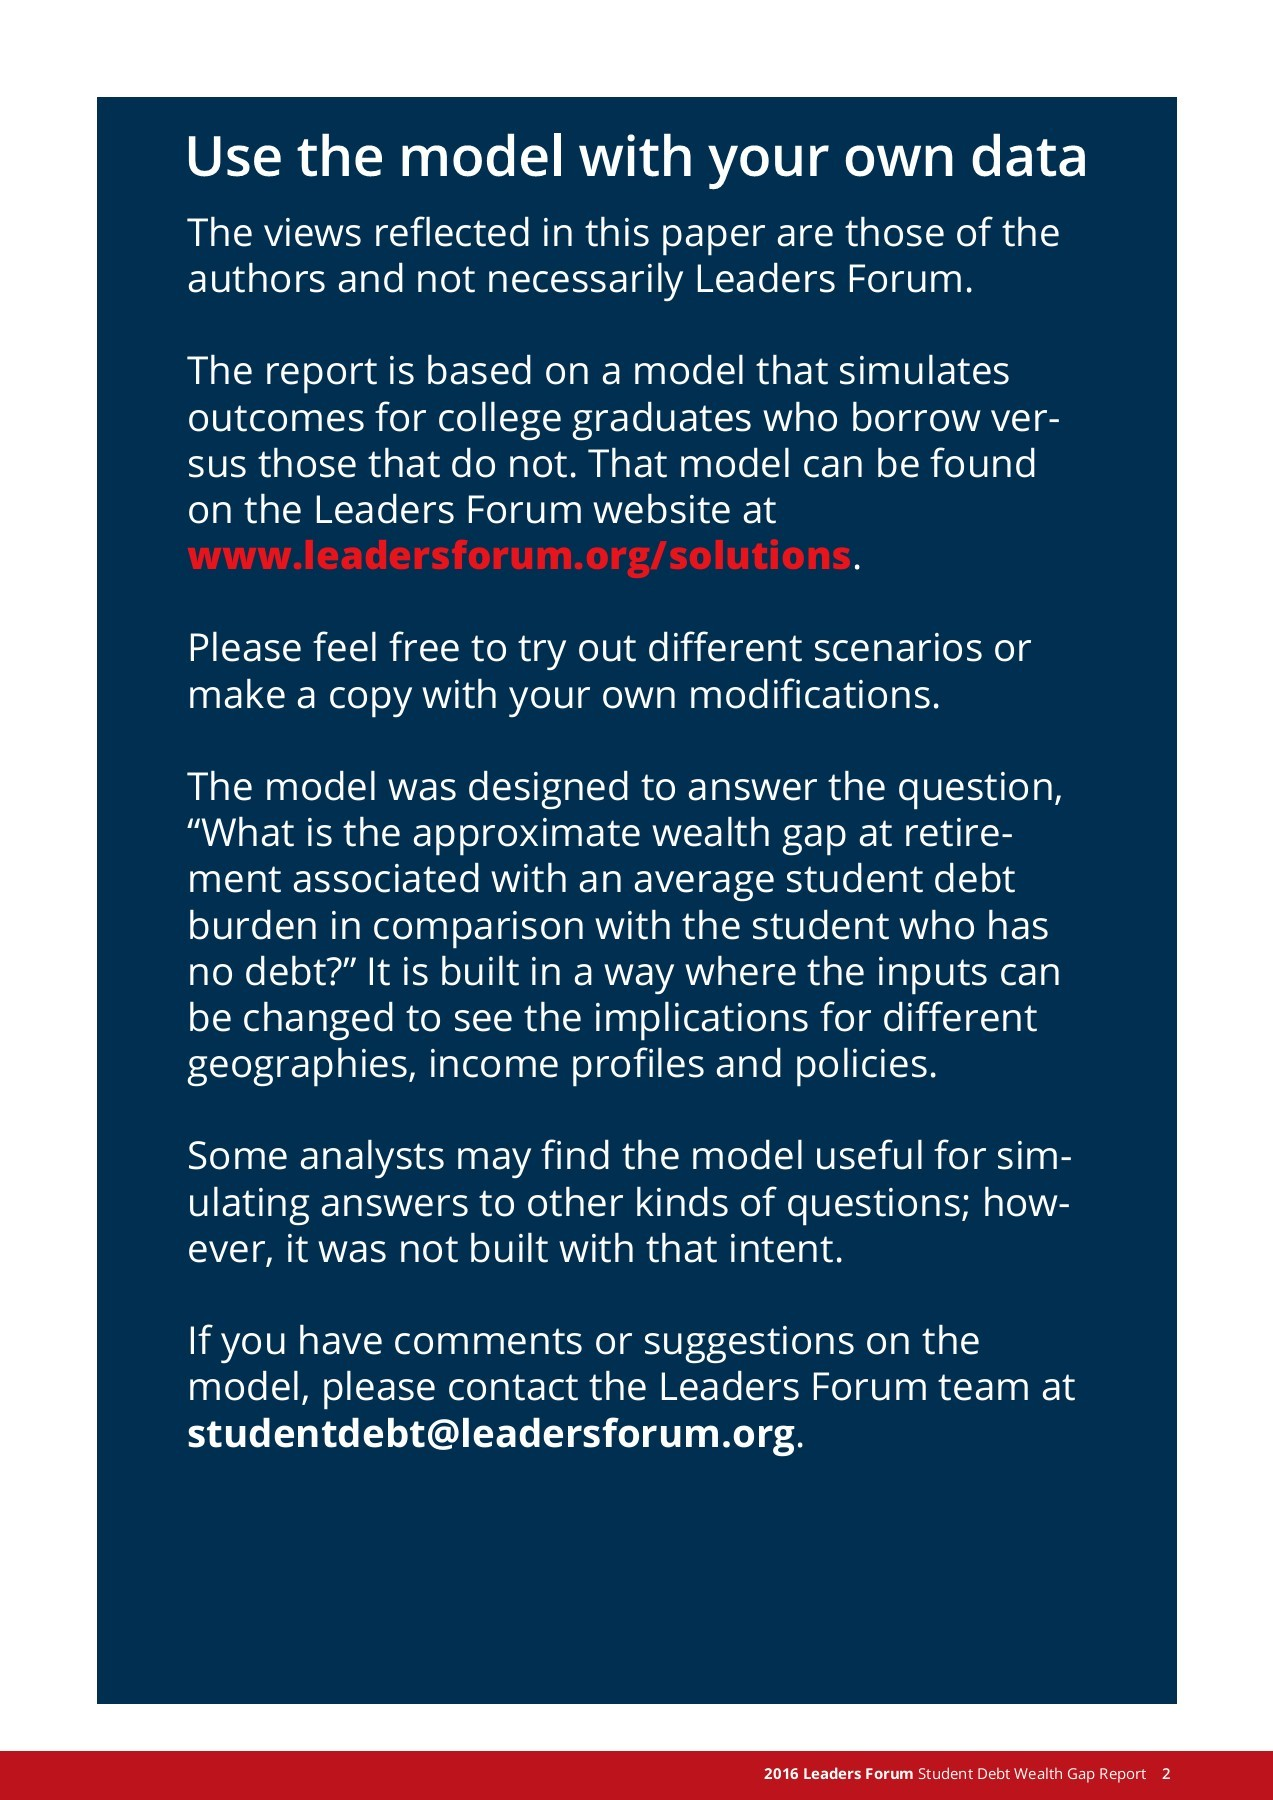 Solutions for America - LeadersForum